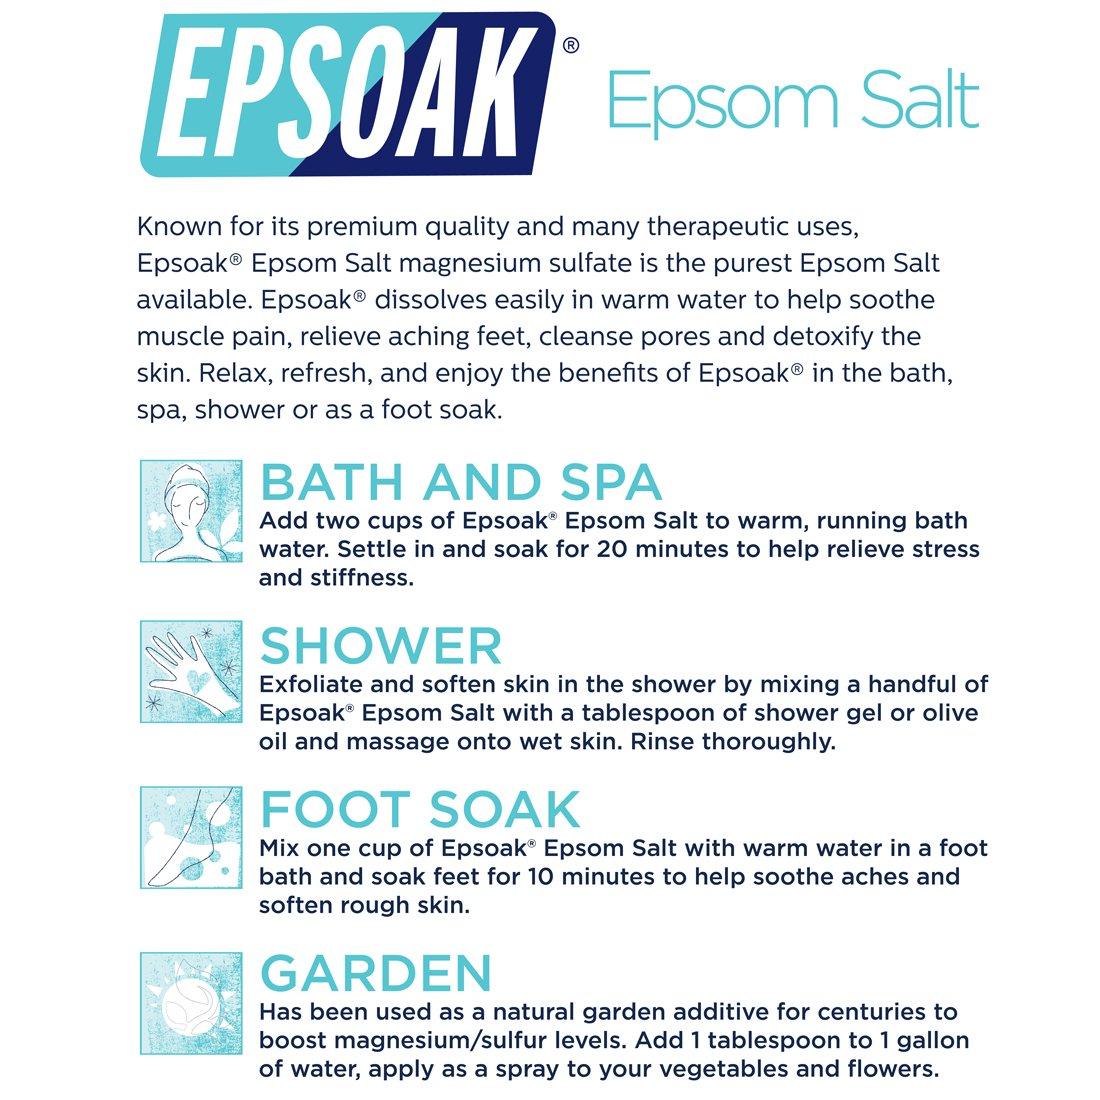 Amazon Epsoak Epsom Salt 10lbs Magnesium Sulfate USP Bath